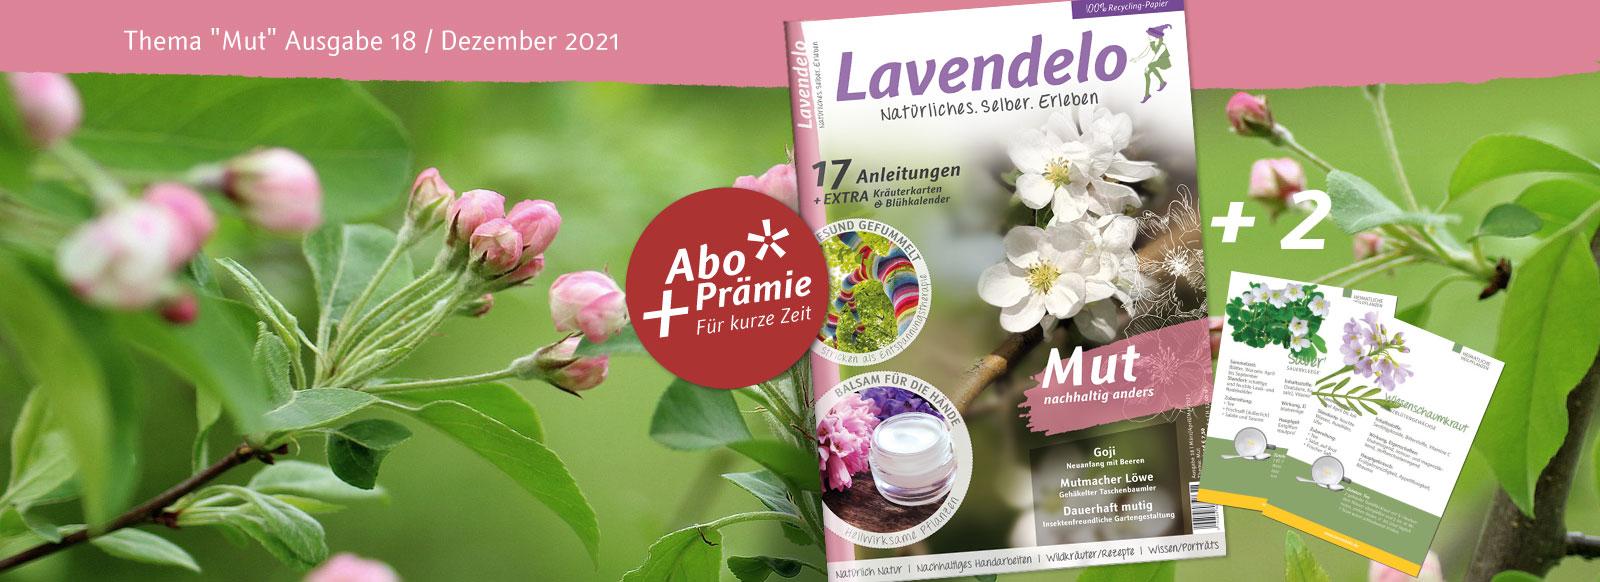 Lavendelo Ausgabe 18 Frühjahr 2021